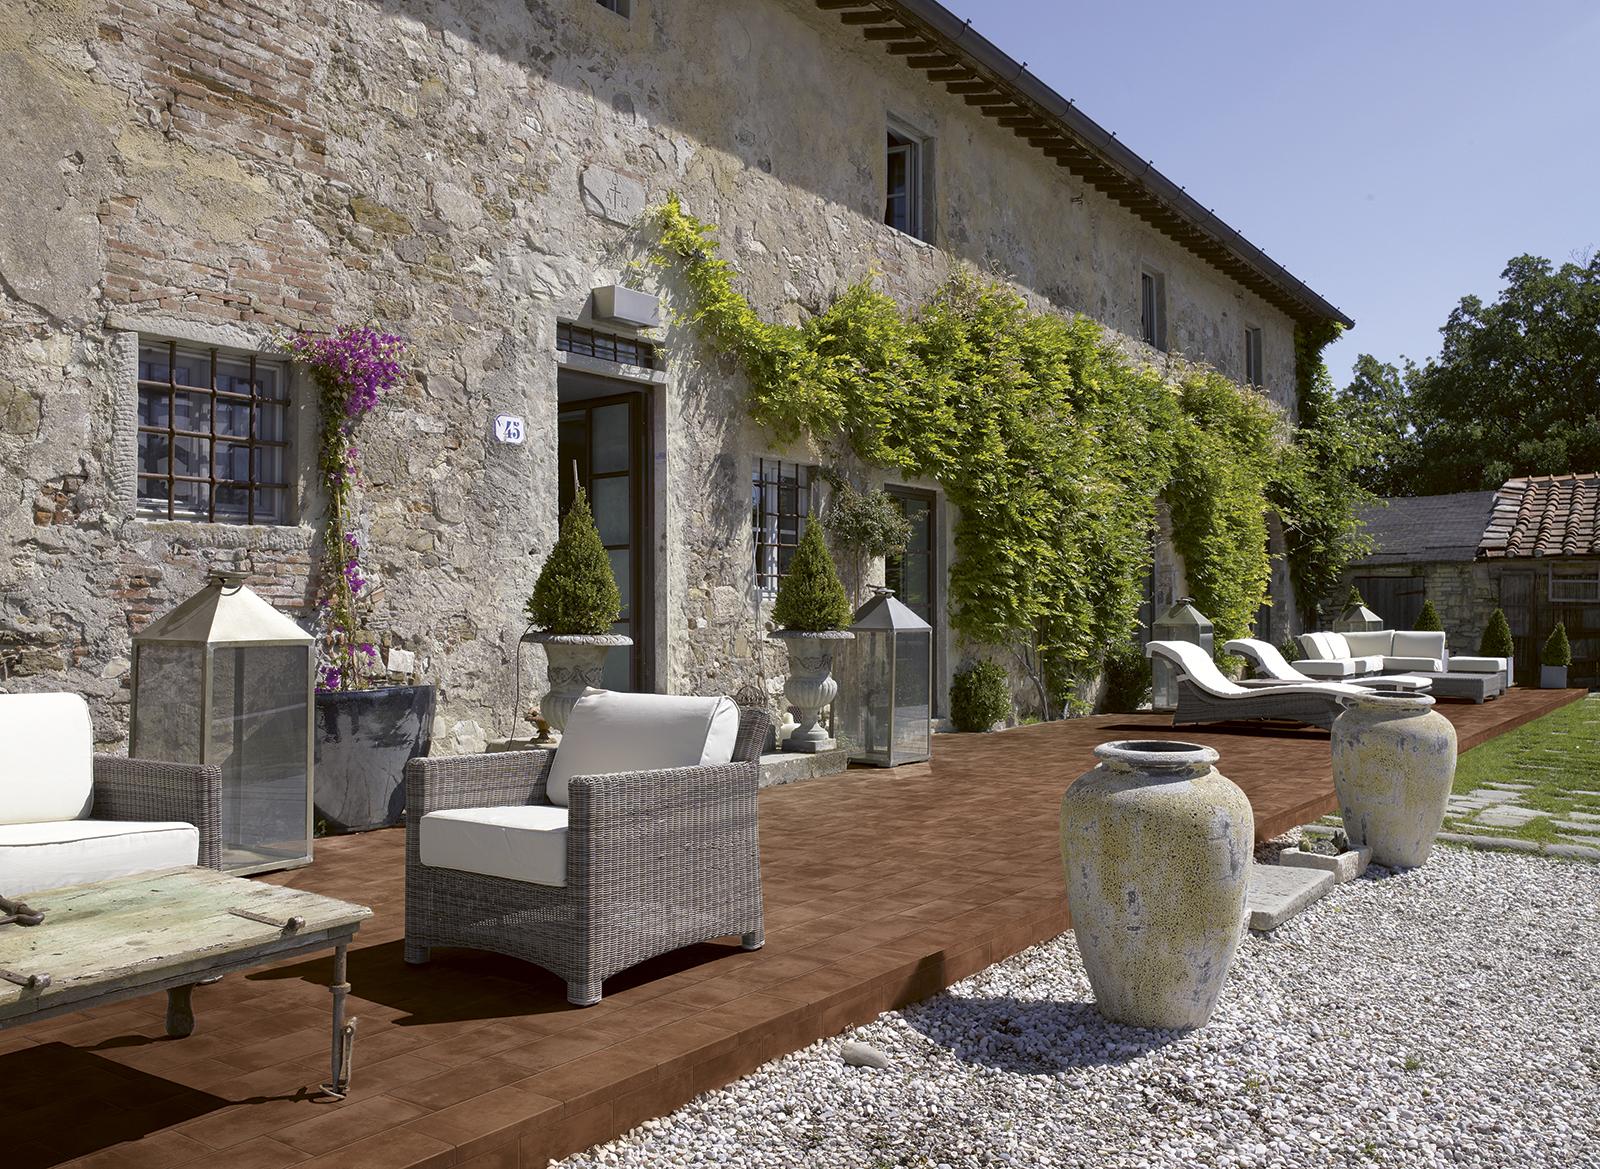 Suelo exterior azulejos gres porcel nico marazzi for Case in pietra e tronchi